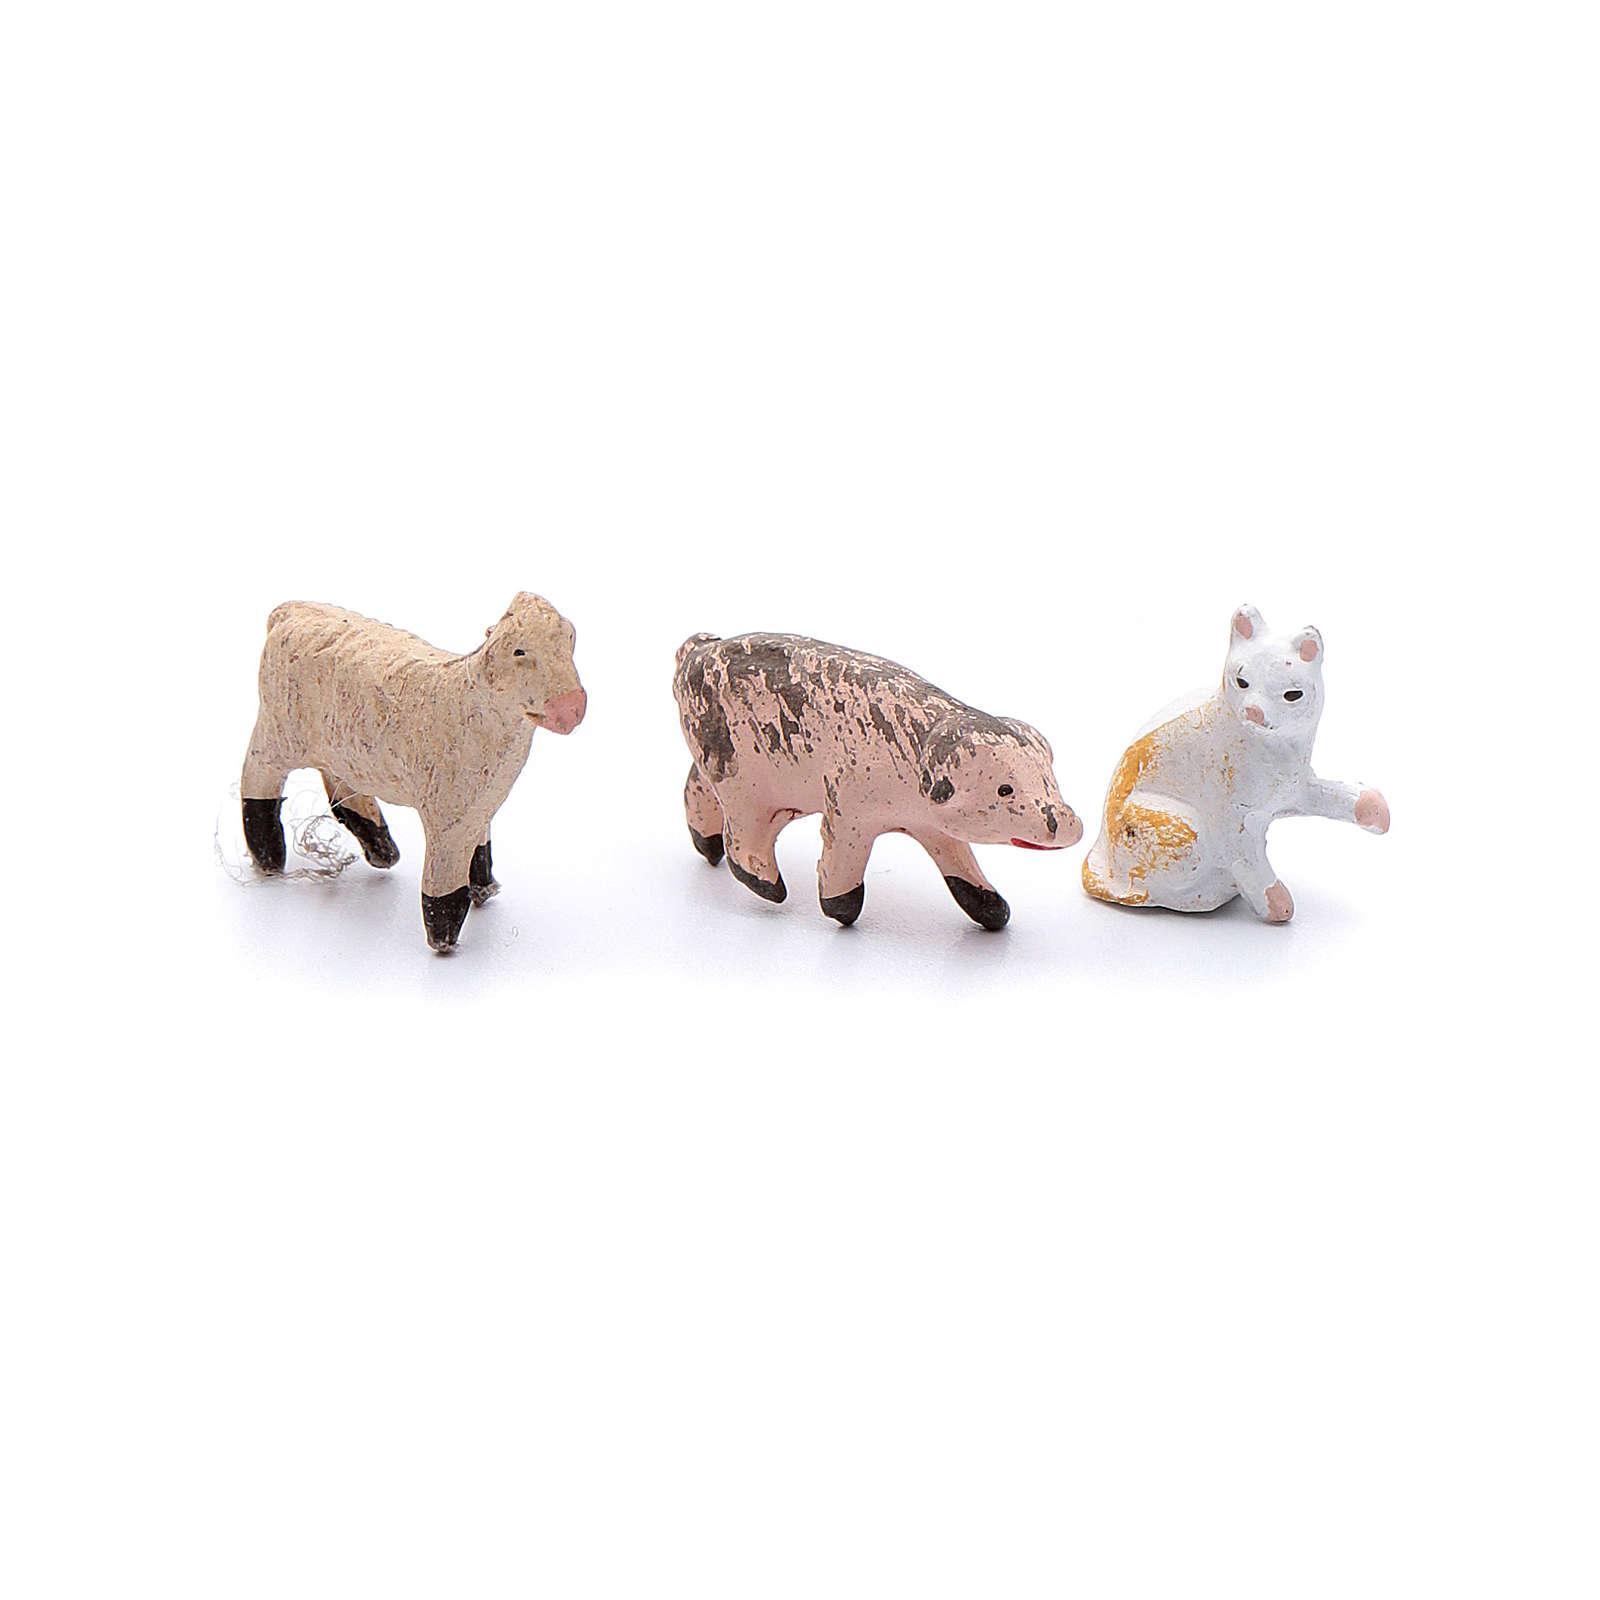 Kit animaletti 9 pezzi presepe fai da te 4 cm 4